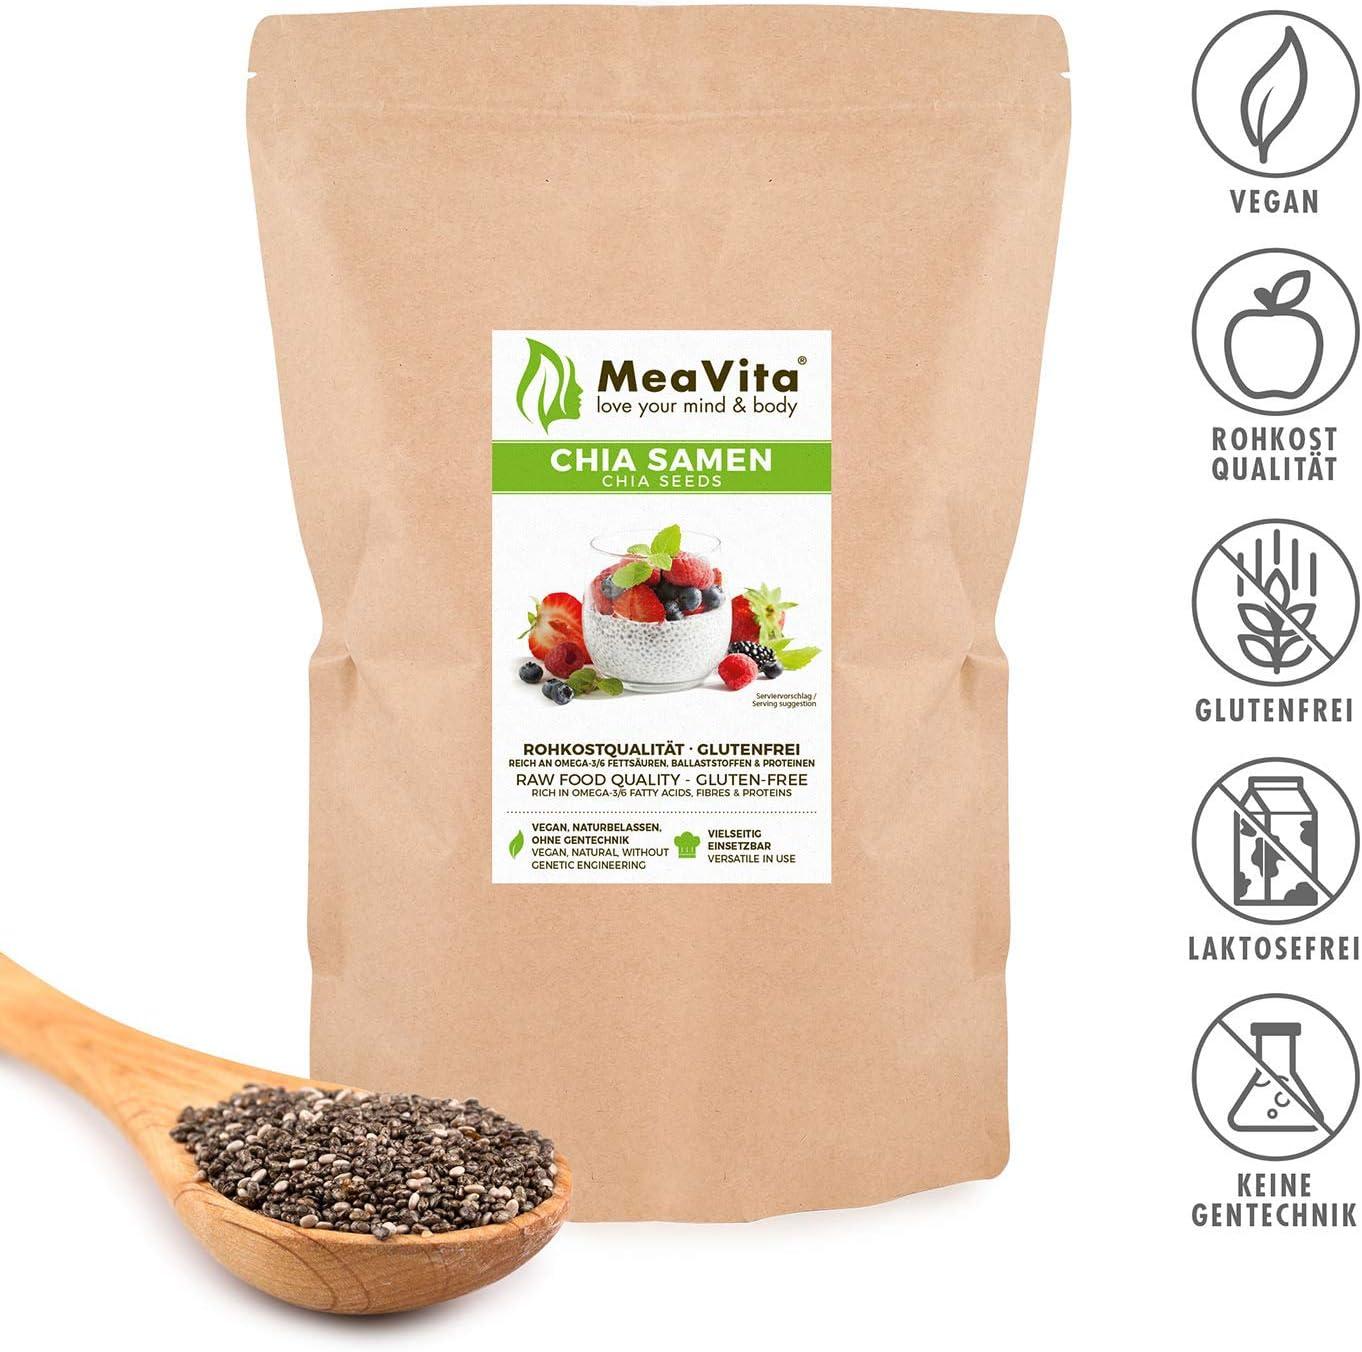 Meavita Premium Semillas De Chía Meavita, 2 x 1 Kg: Amazon.es ...